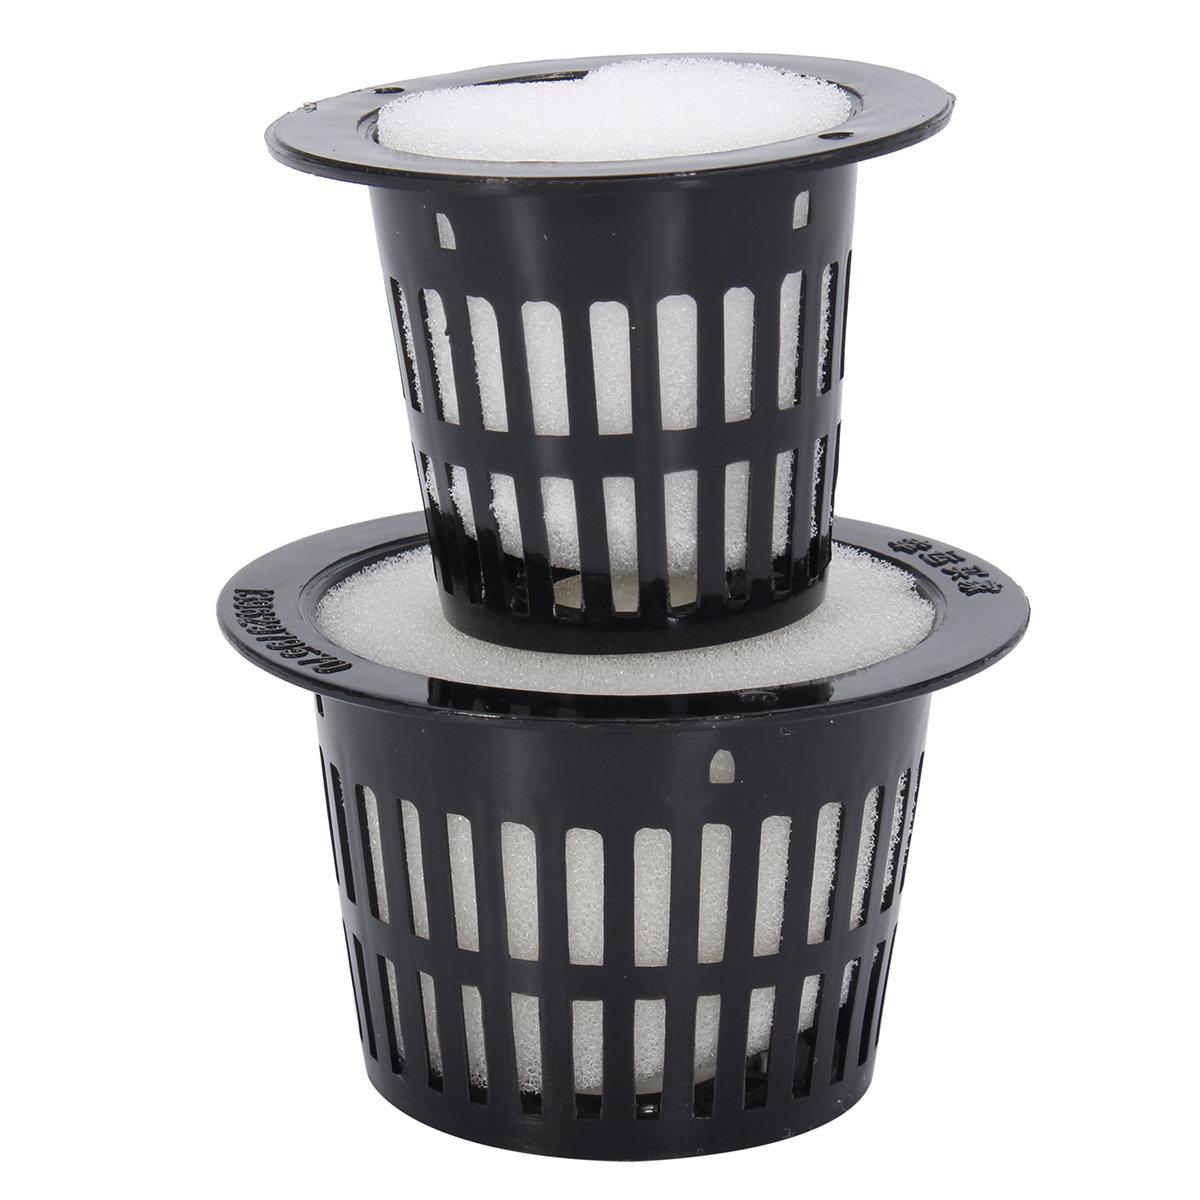 10 Mesh Pot Net Basket Clone Collar Foam Insert Hydroponic Aeroponic Garden Tools